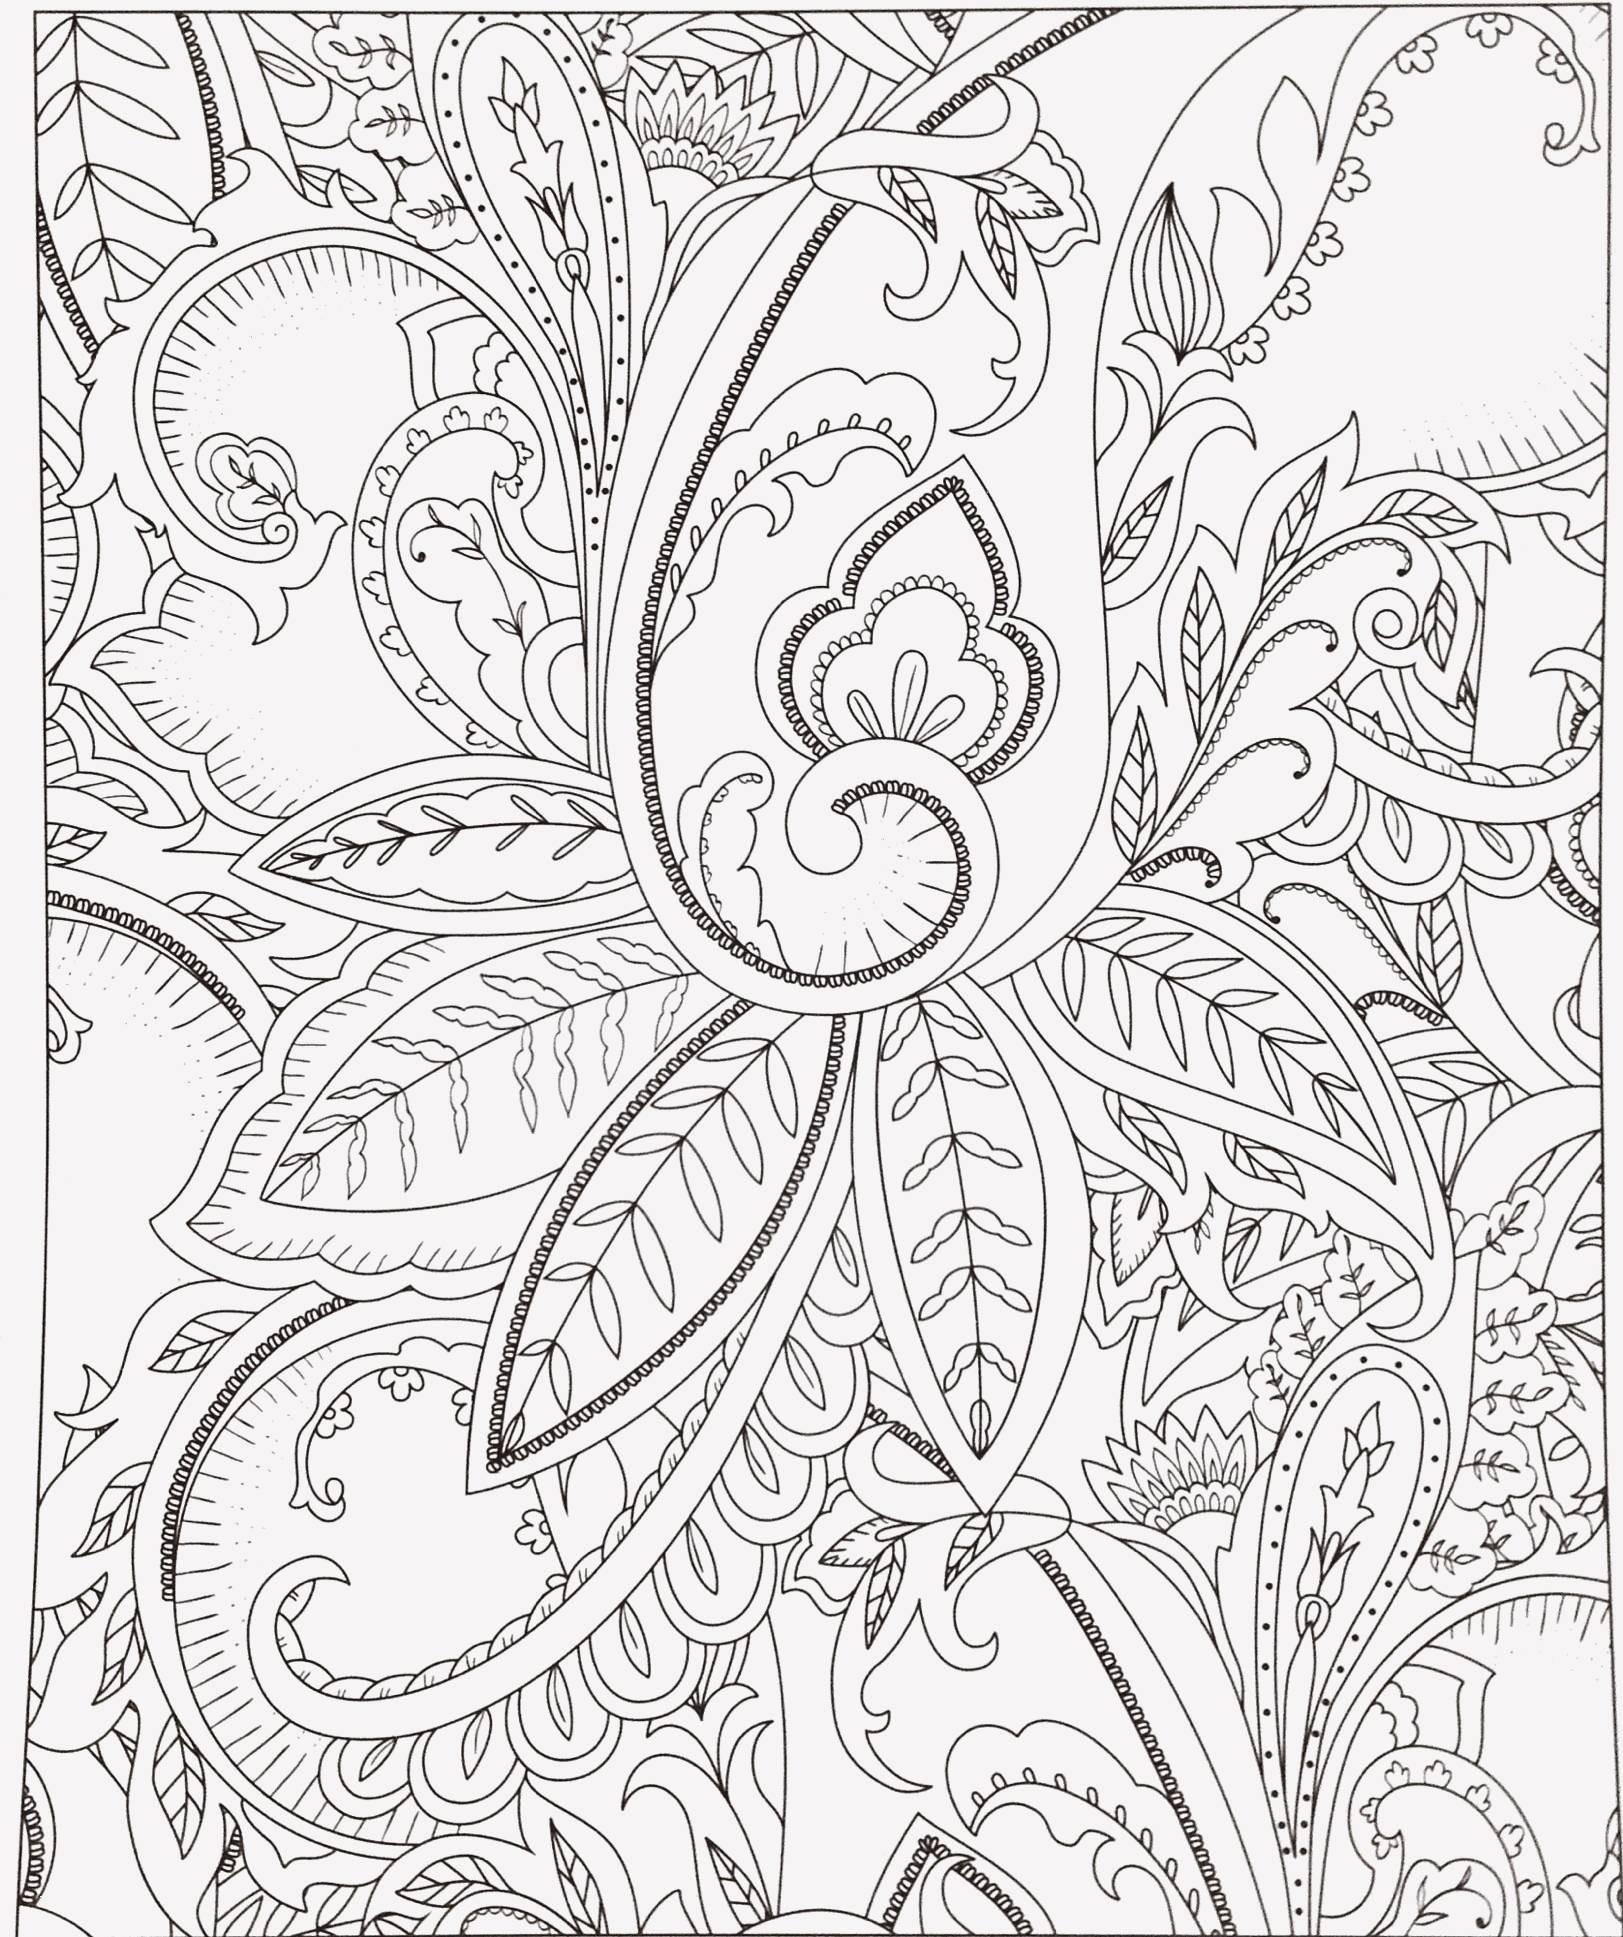 John Deere Ausmalbilder Einzigartig 25 Druckbar Ausmalbilder John Deere Stock